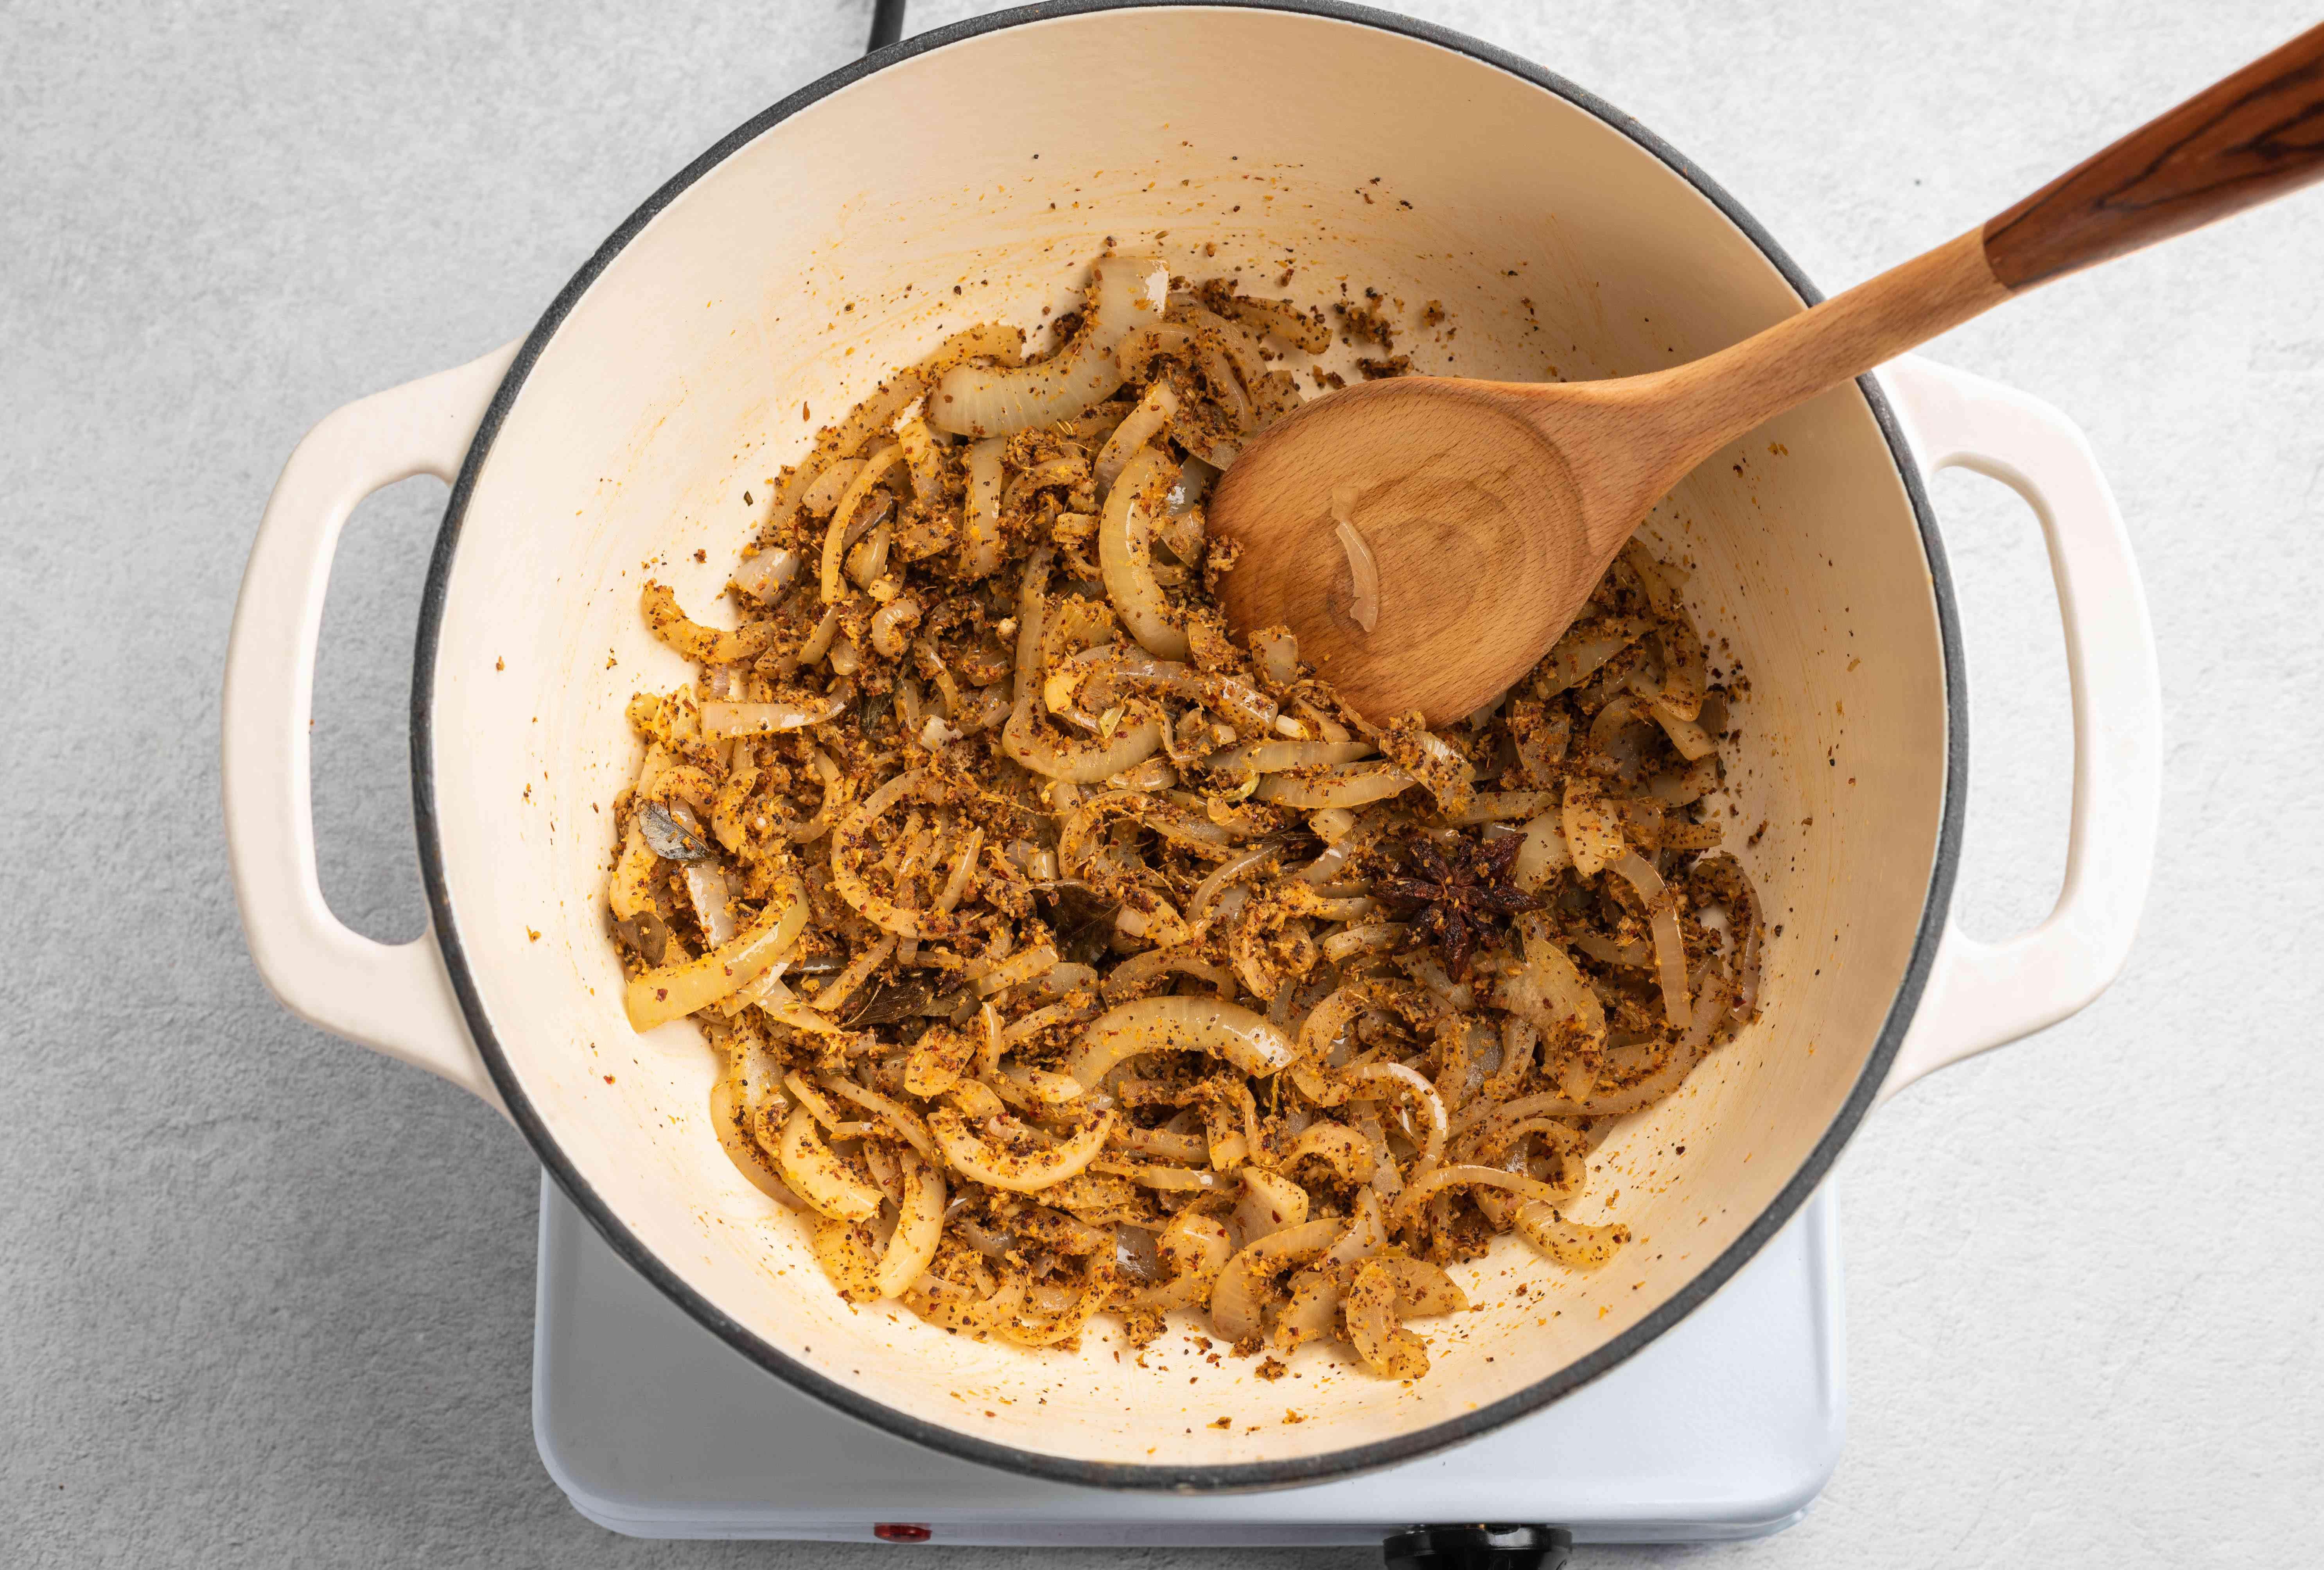 Add spice paste